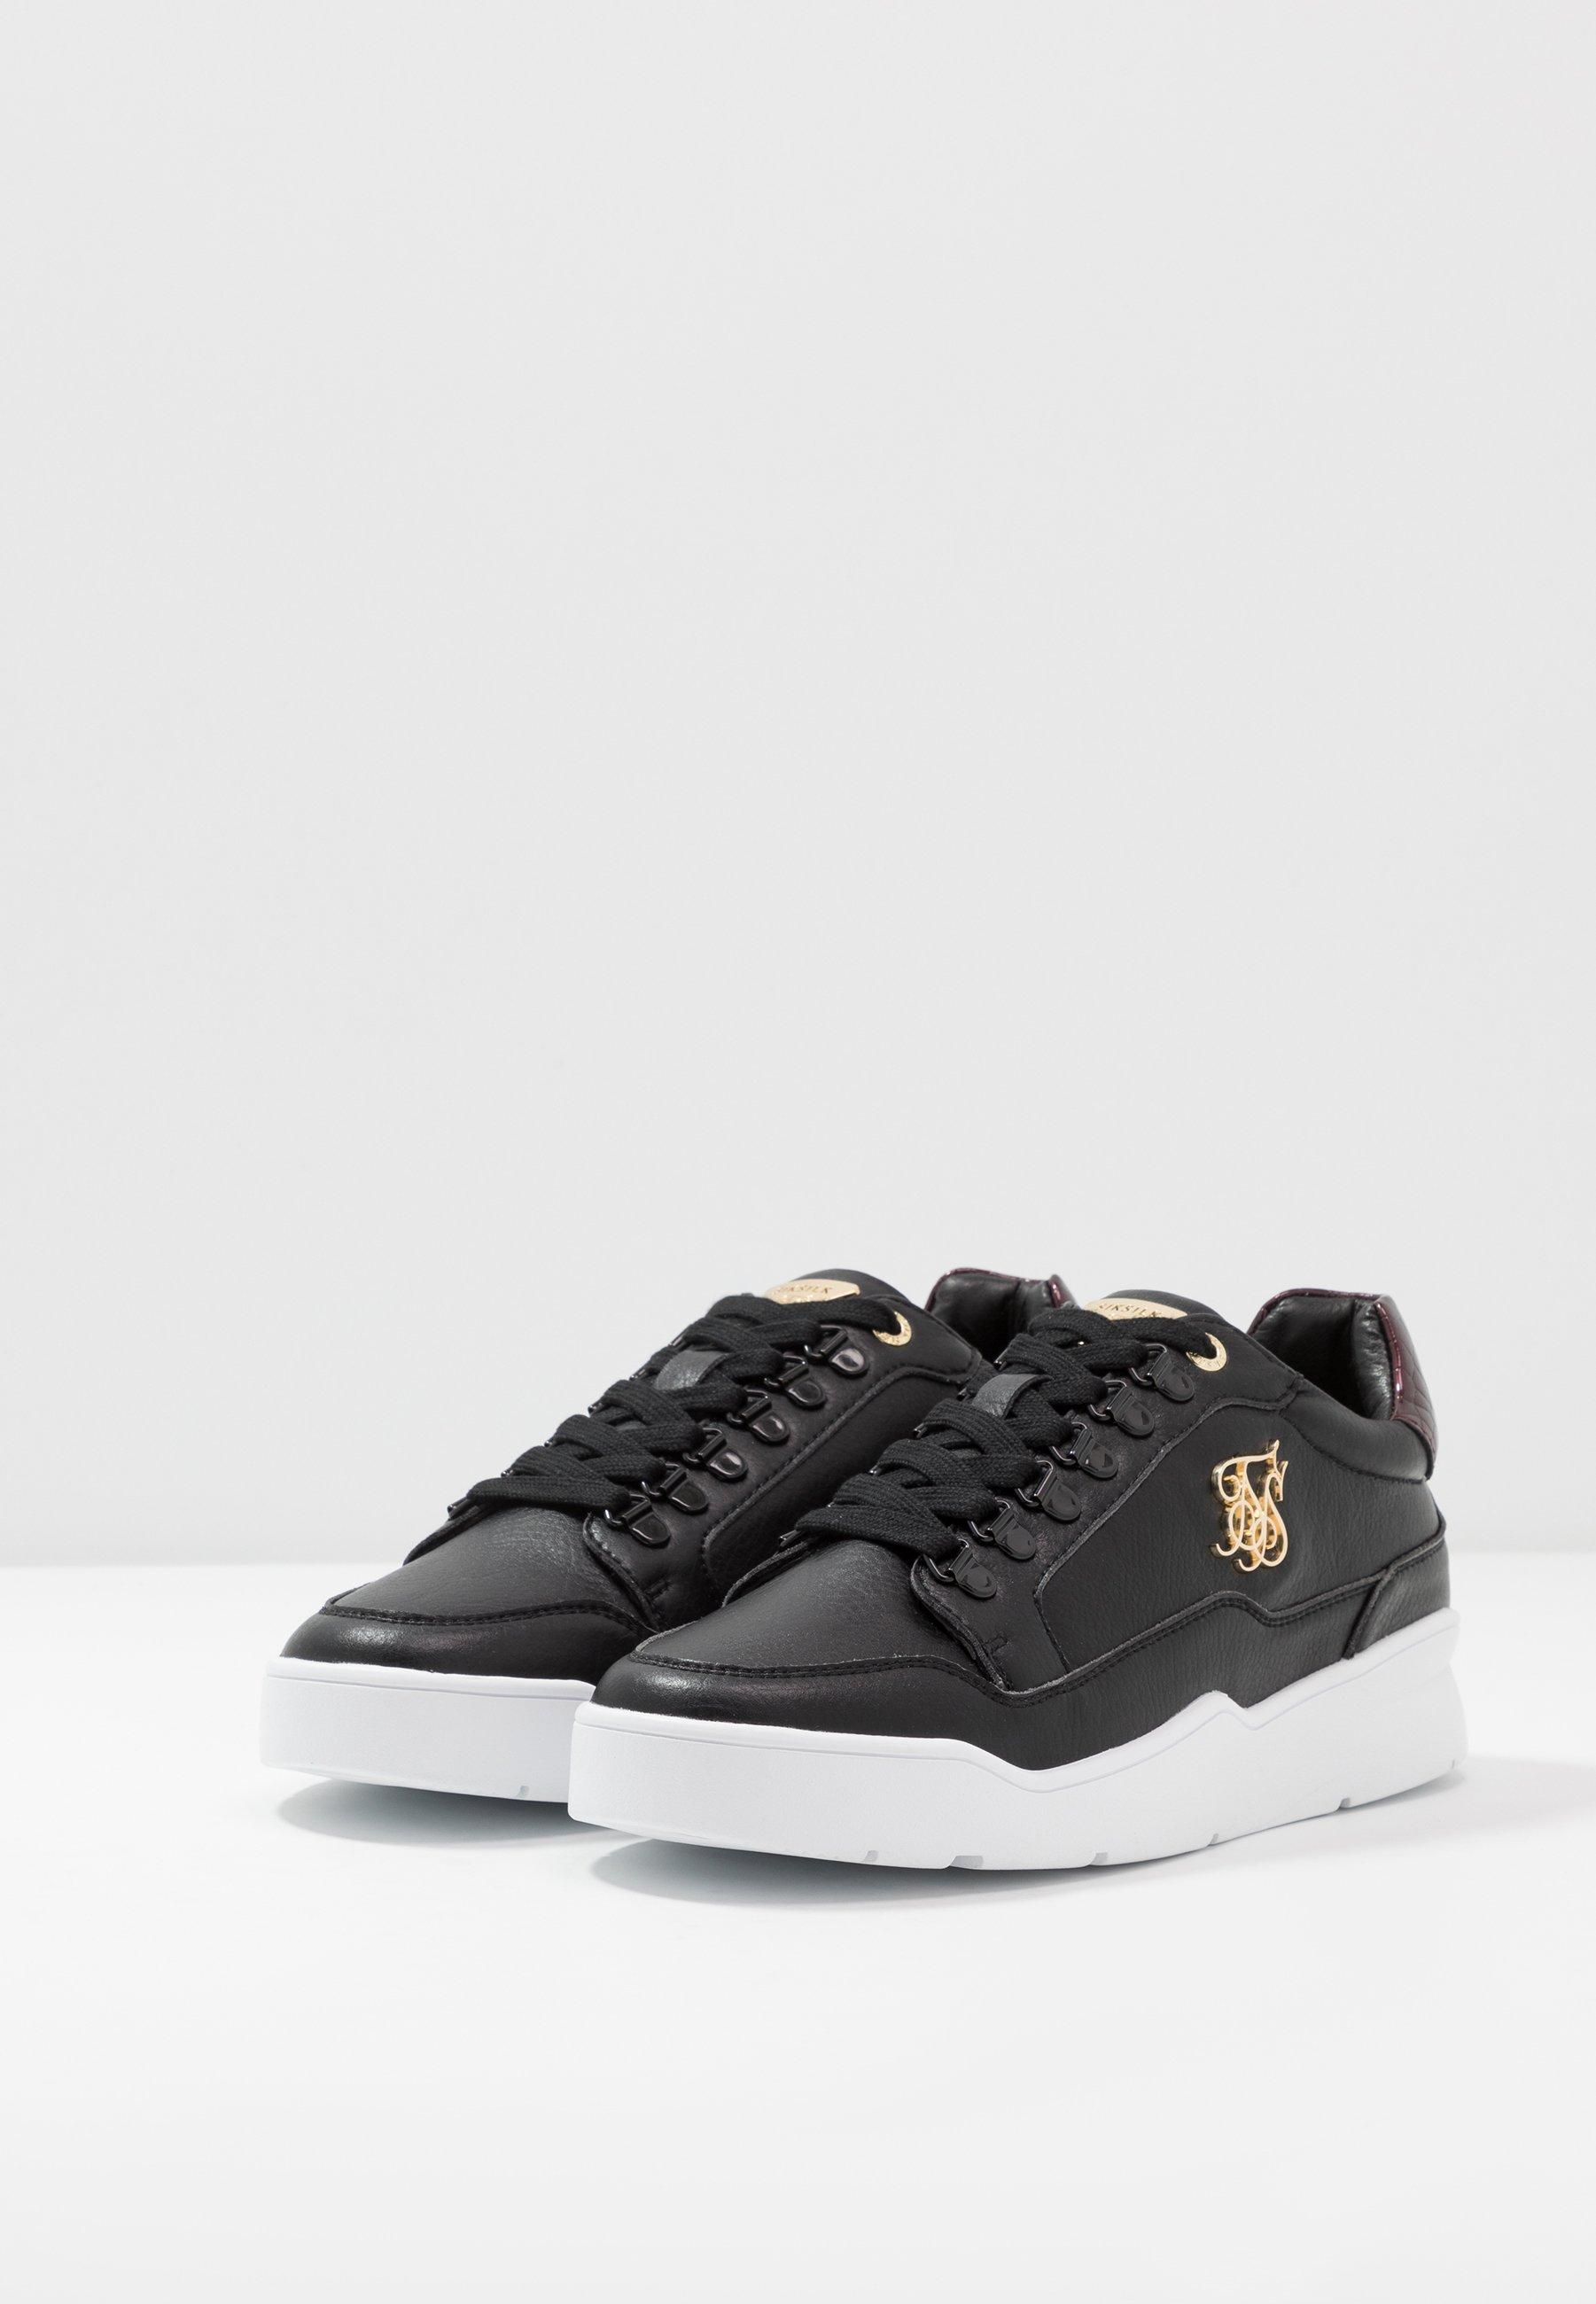 Prezzo di fabbrica Scarpe da uomo SIKSILK D-RING PURSUIT Sneakers basse black/burgundy